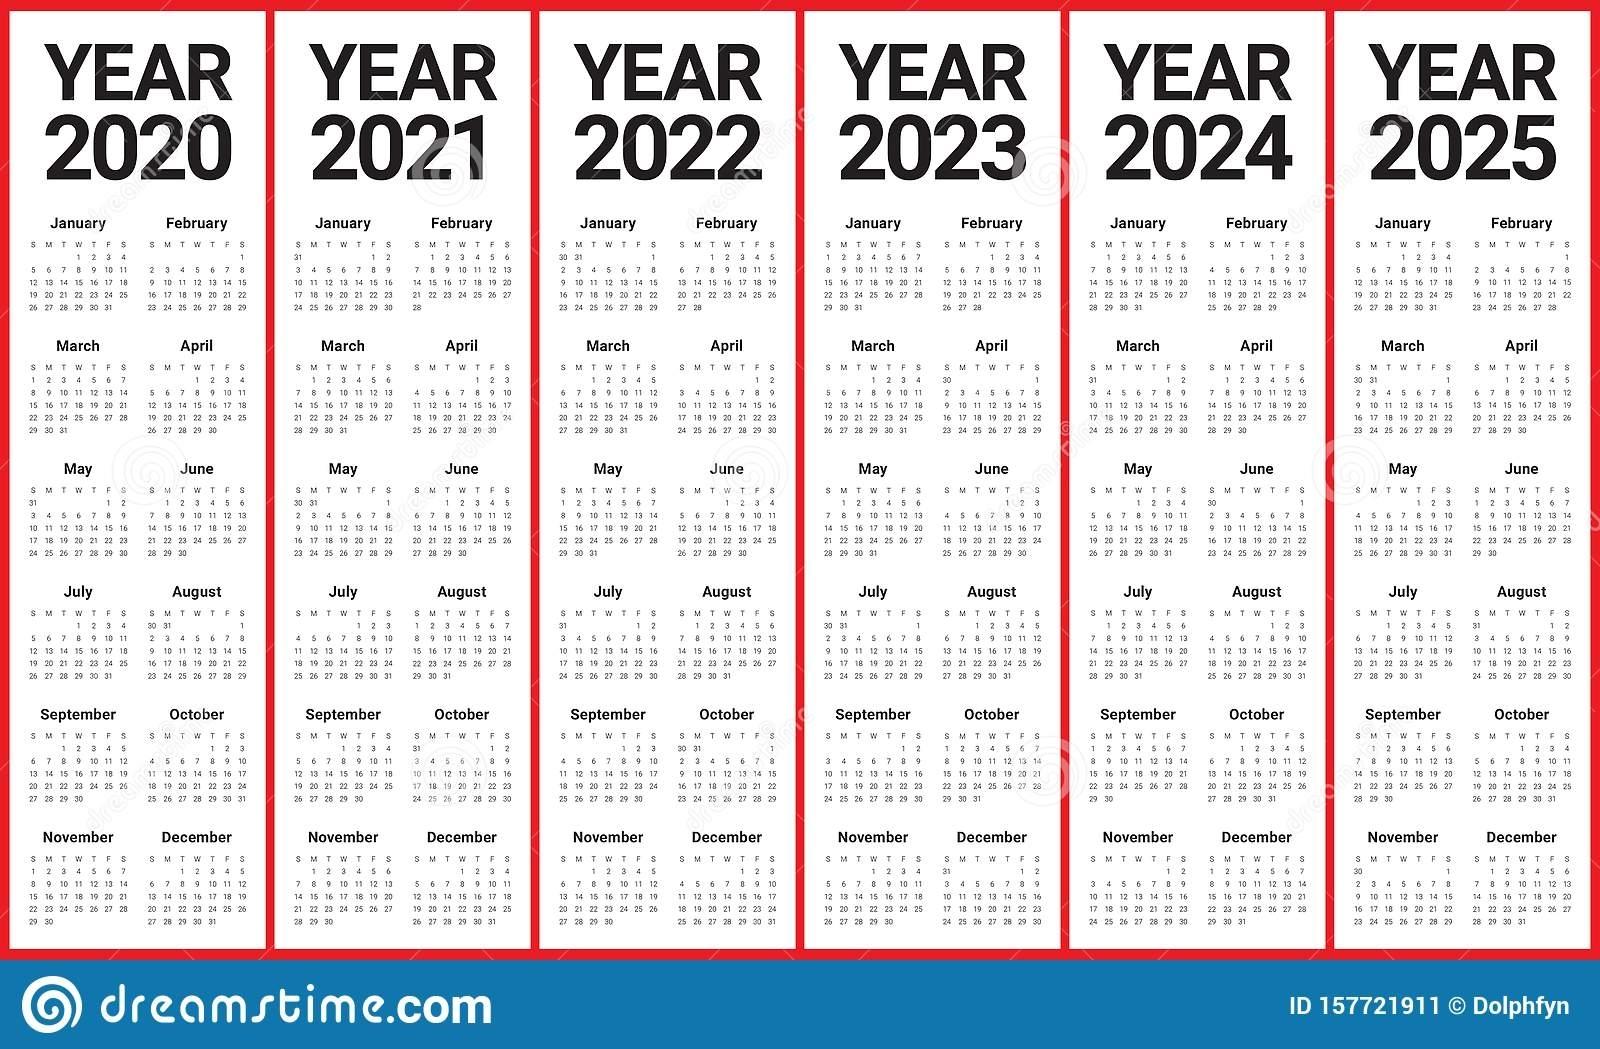 Year 2020 2021 2022 2023 2024 2025 Calendar Vector Design inside 2020 2021 2022 2023 Calendar Printable One Page